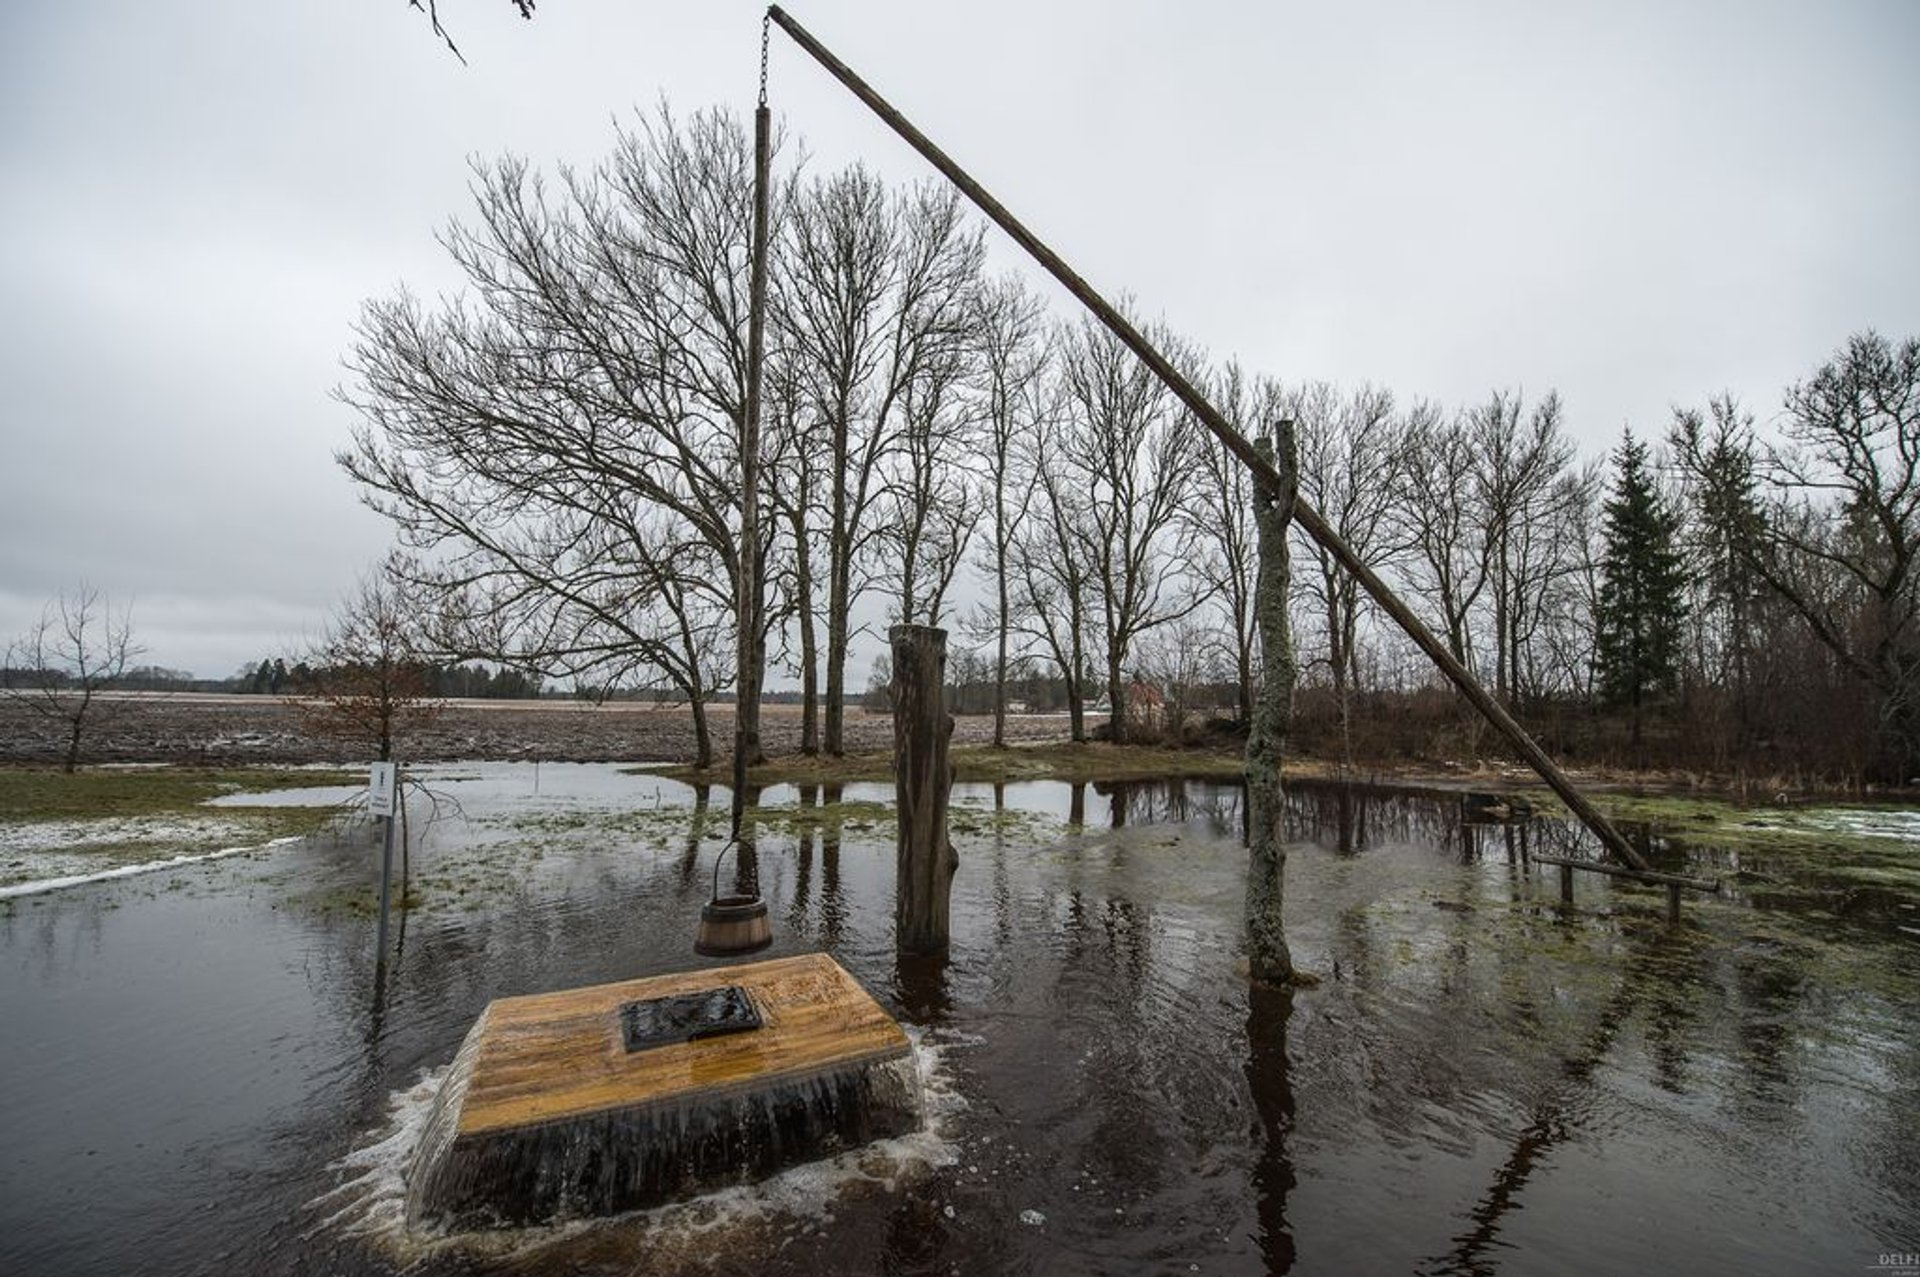 Witch's well at Sulu farm, Kose parish, Estonia 2020